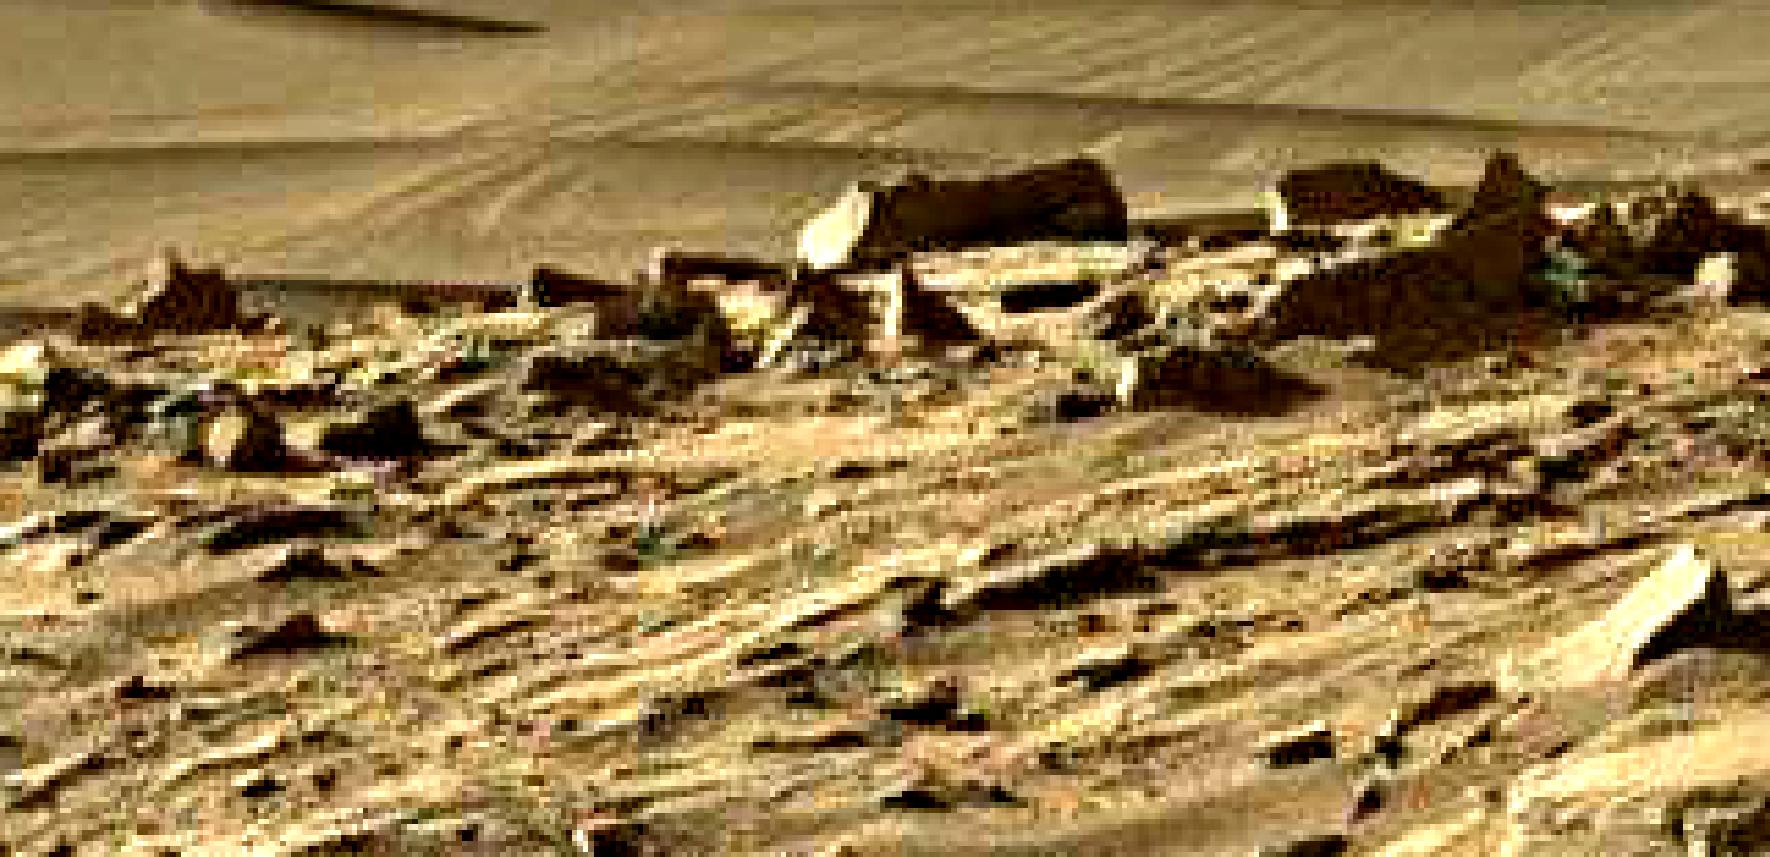 Mars Sol 1270 Curiosity – 1270ML0059460270504397E01 | Was ...